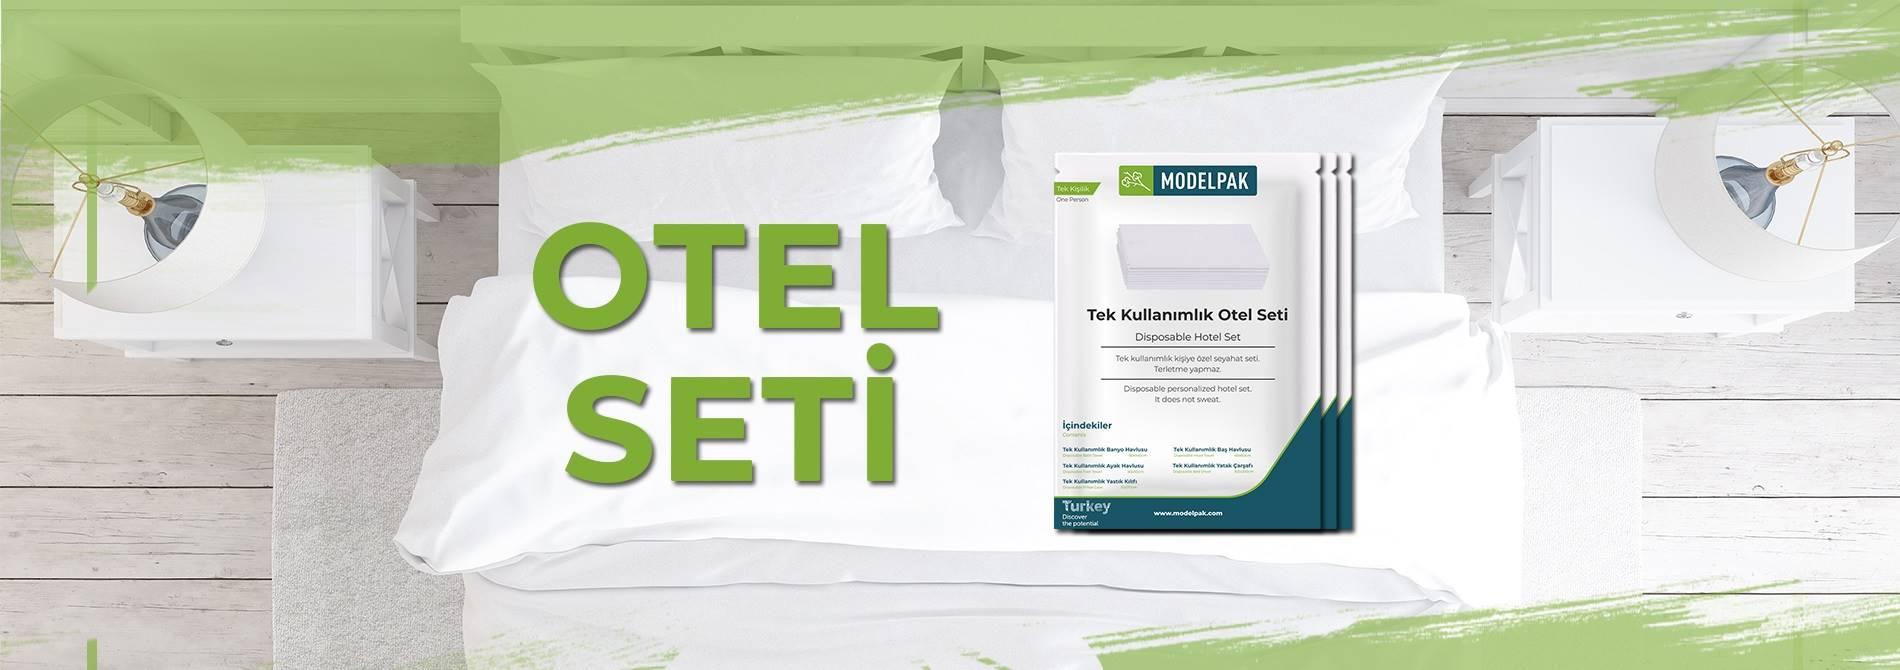 disposable hotel set